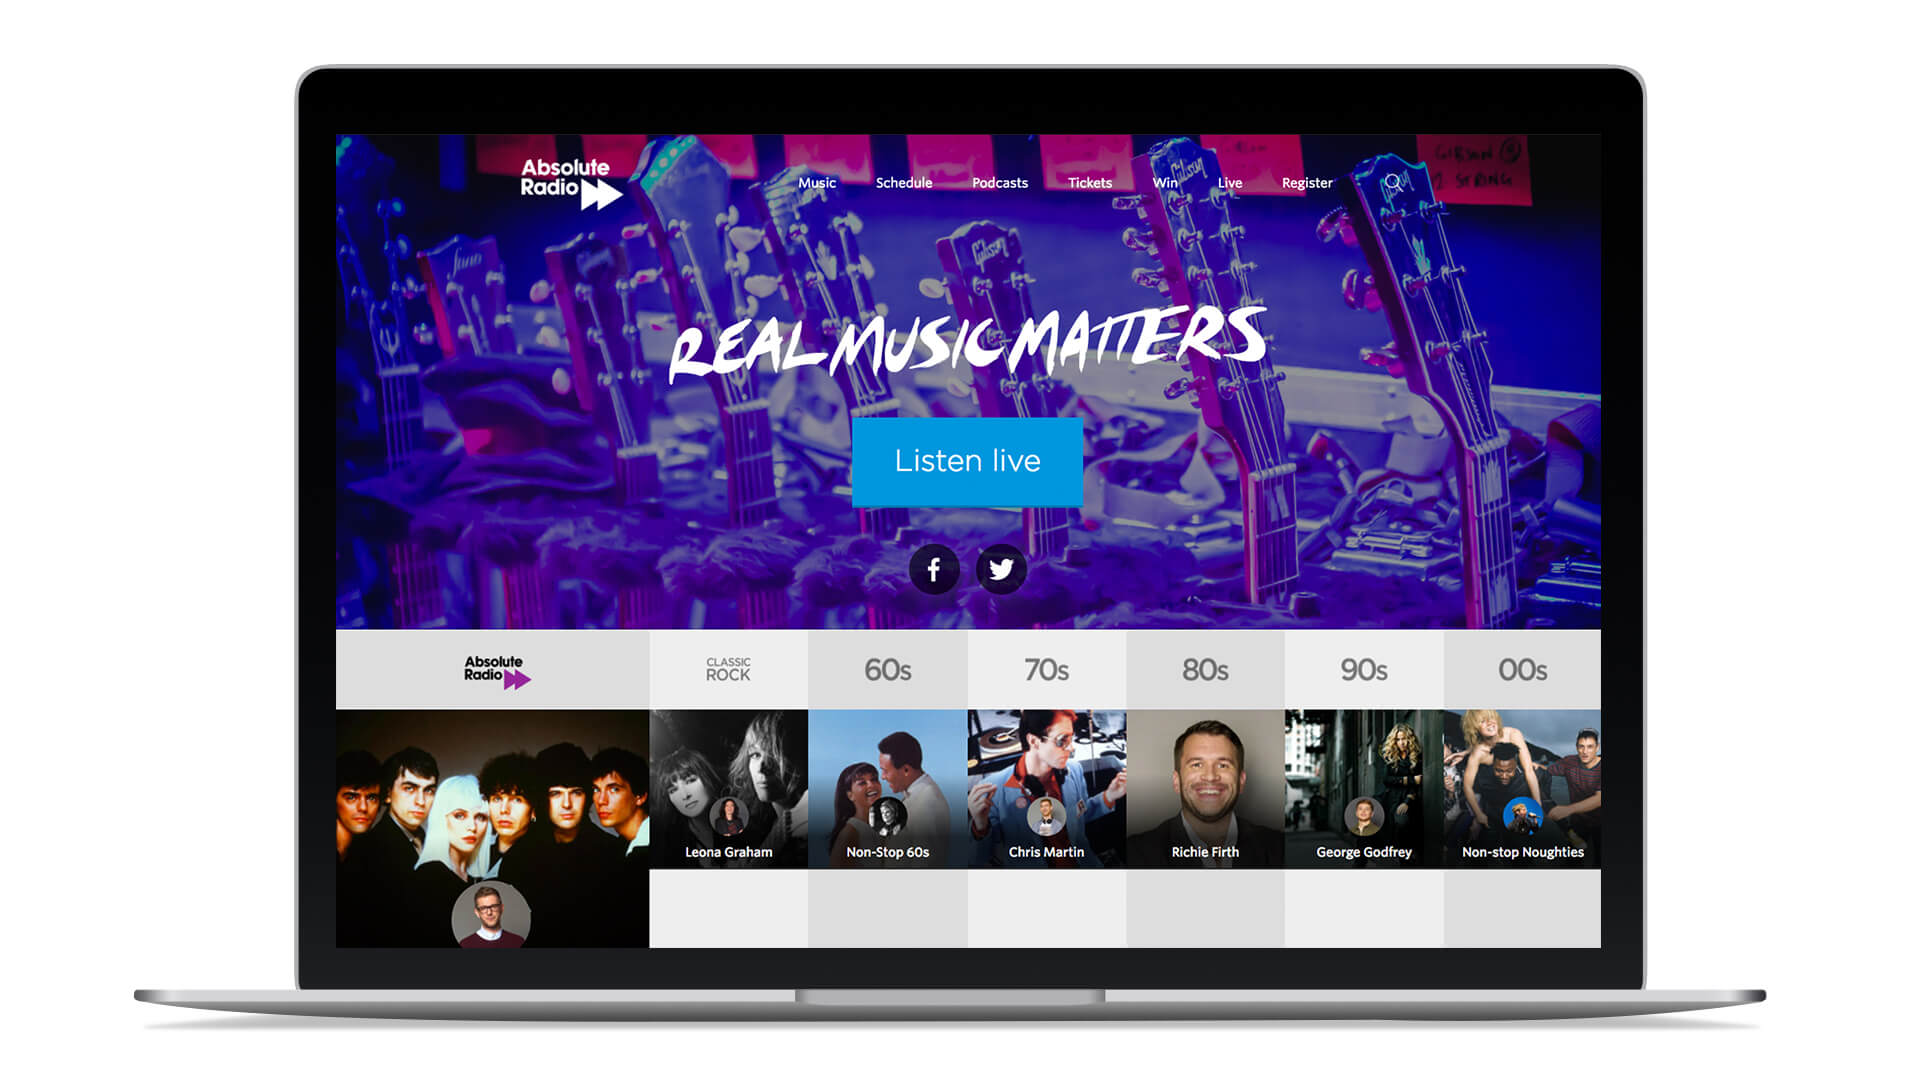 Absolute radio brand website refresh template design